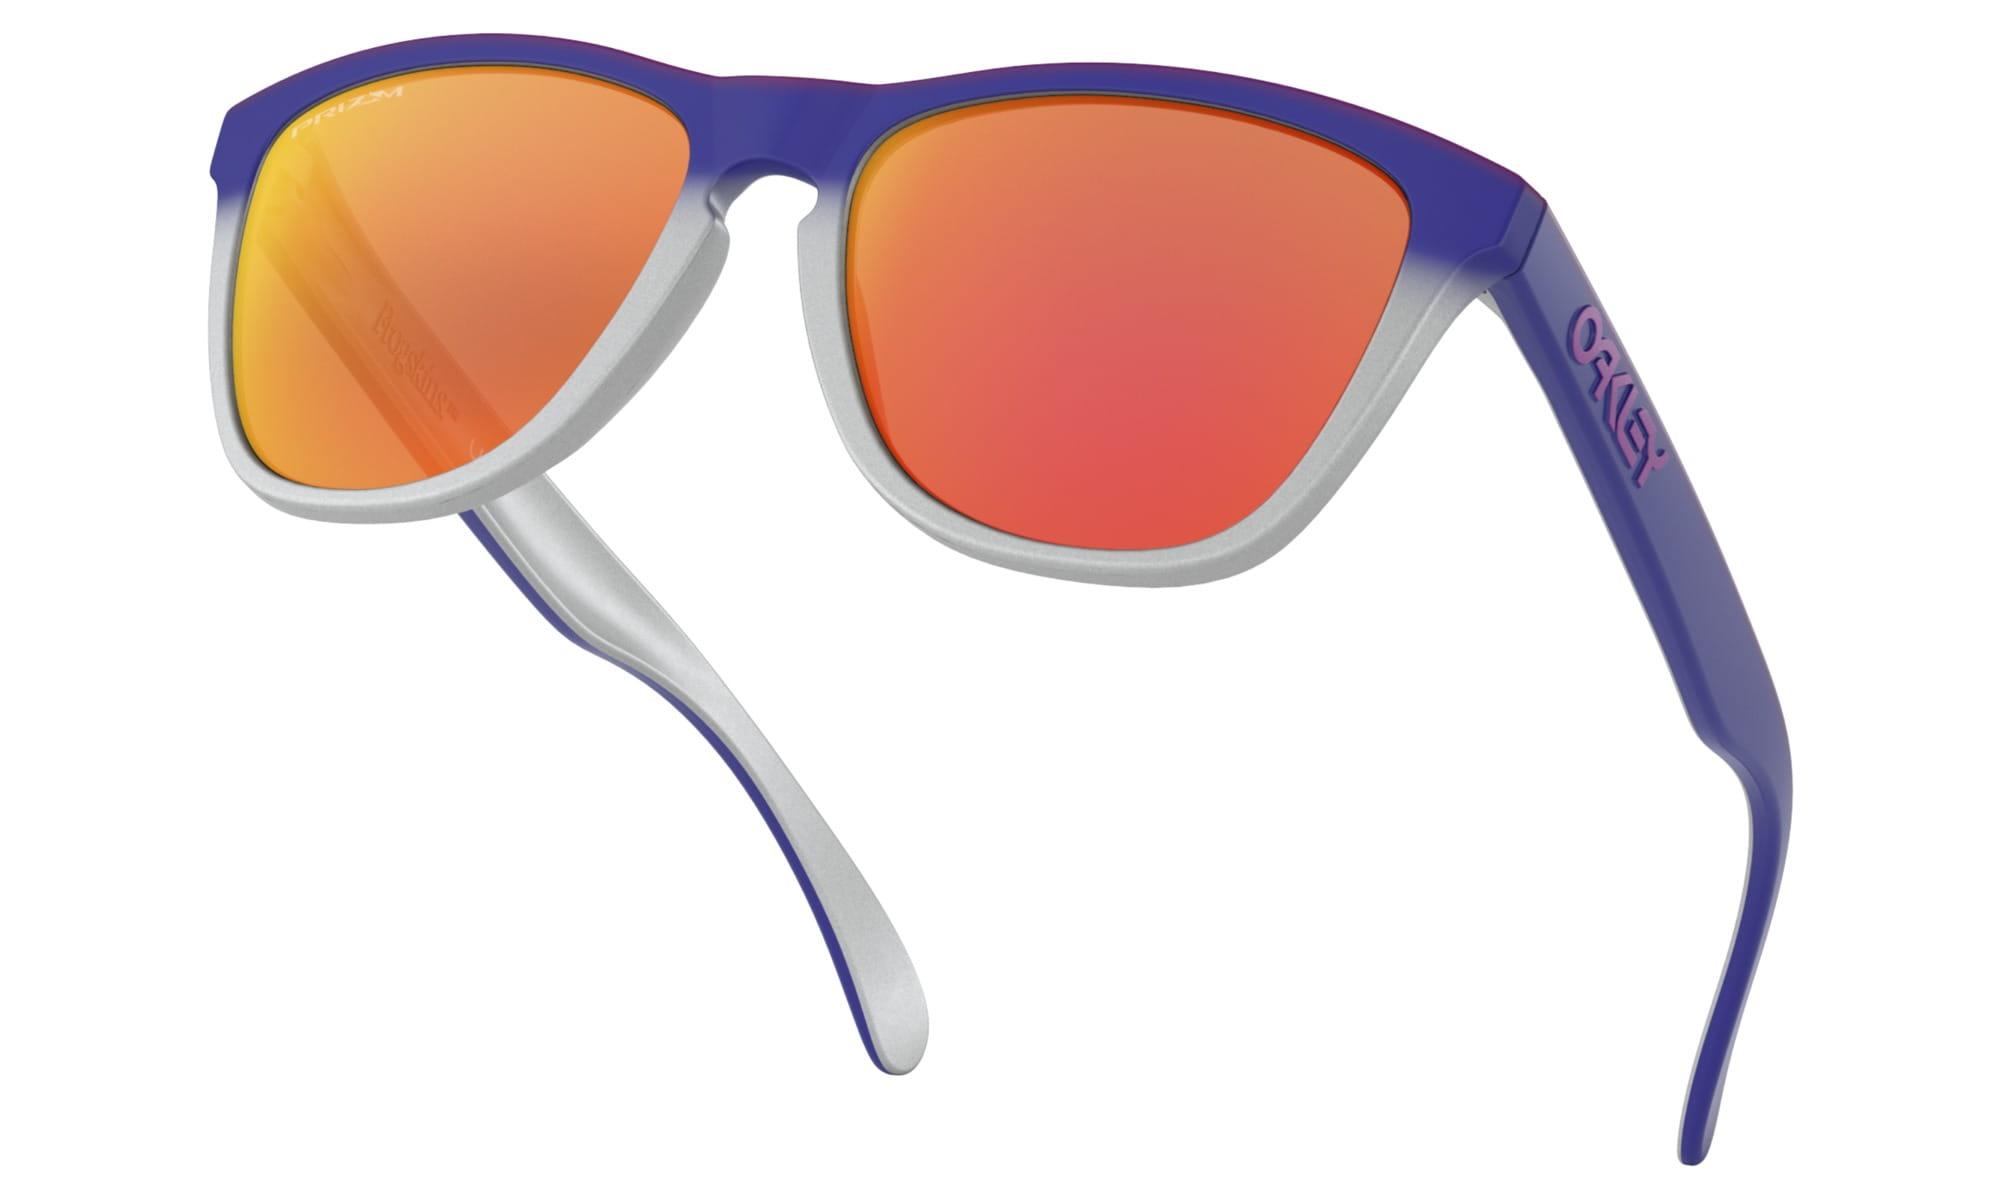 91c1282229 Okulary Oakley Frogskins Splatterfade Collection Pink Blue Fade ...